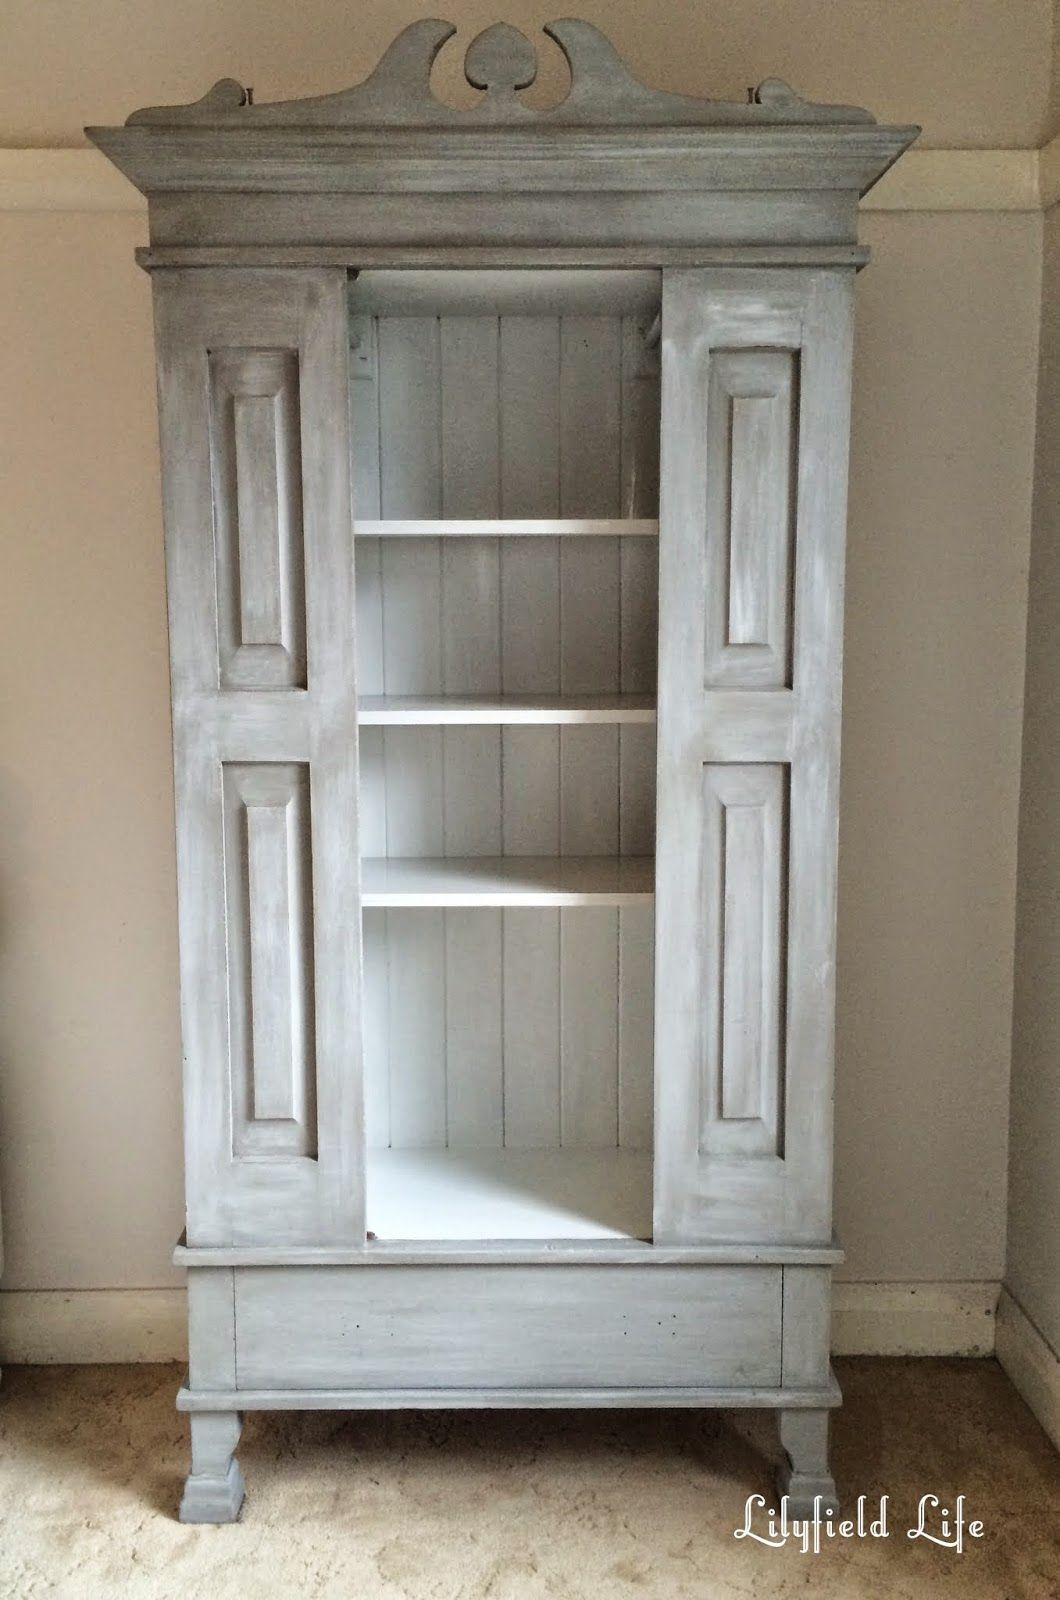 Lilyfield life restoration hardware look cupboard - Restoration hardware cabinets ...